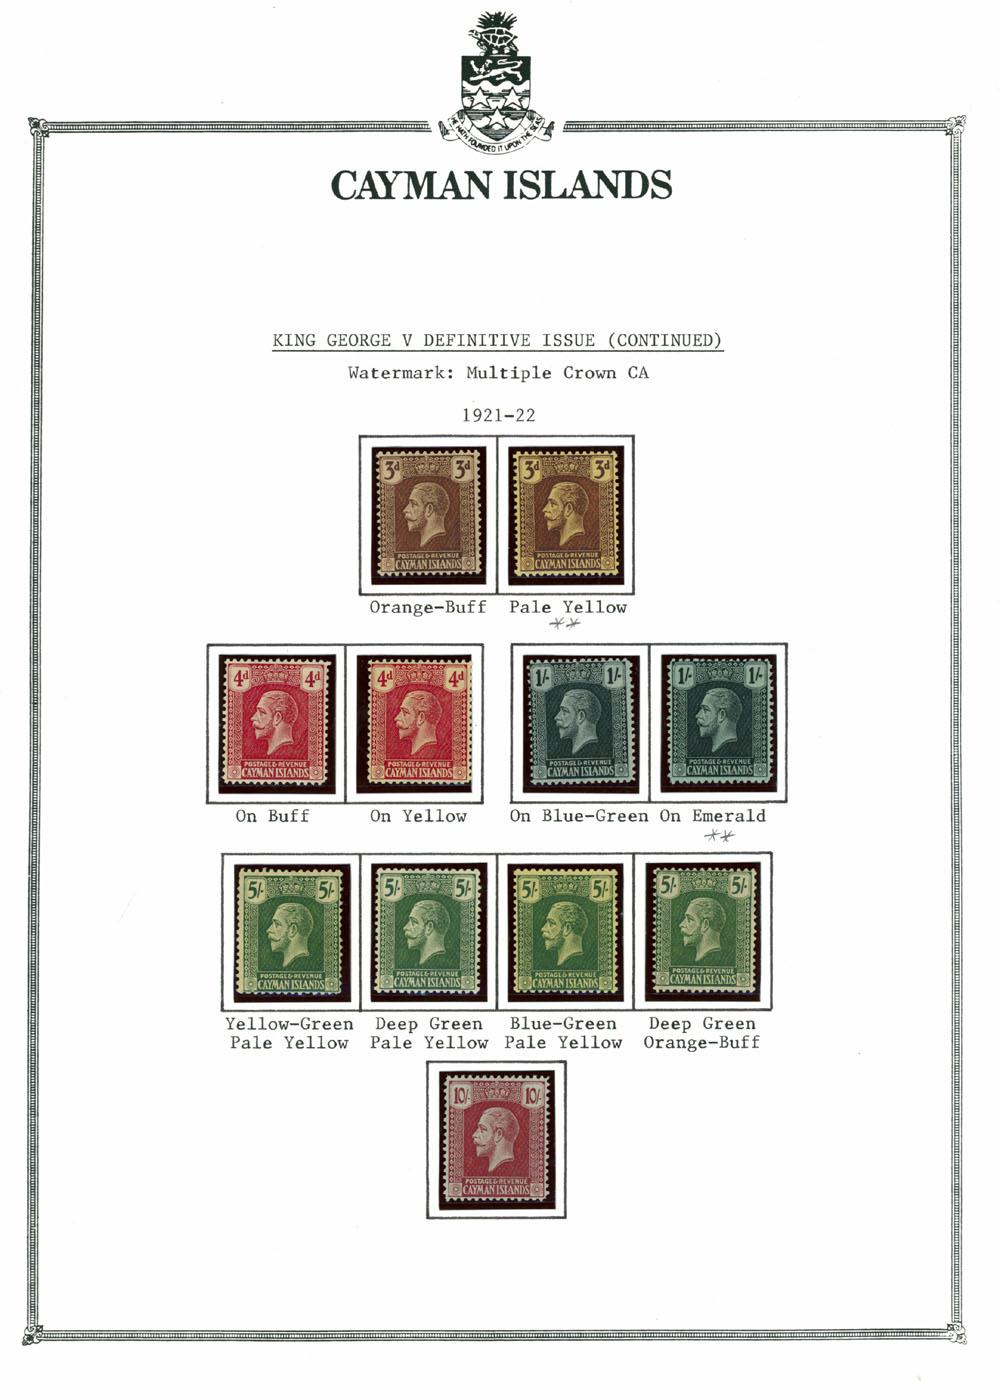 Lot 215 - British Commonwealth cayman islands -  Raritan Stamps Inc. Live Bidding Auction #89